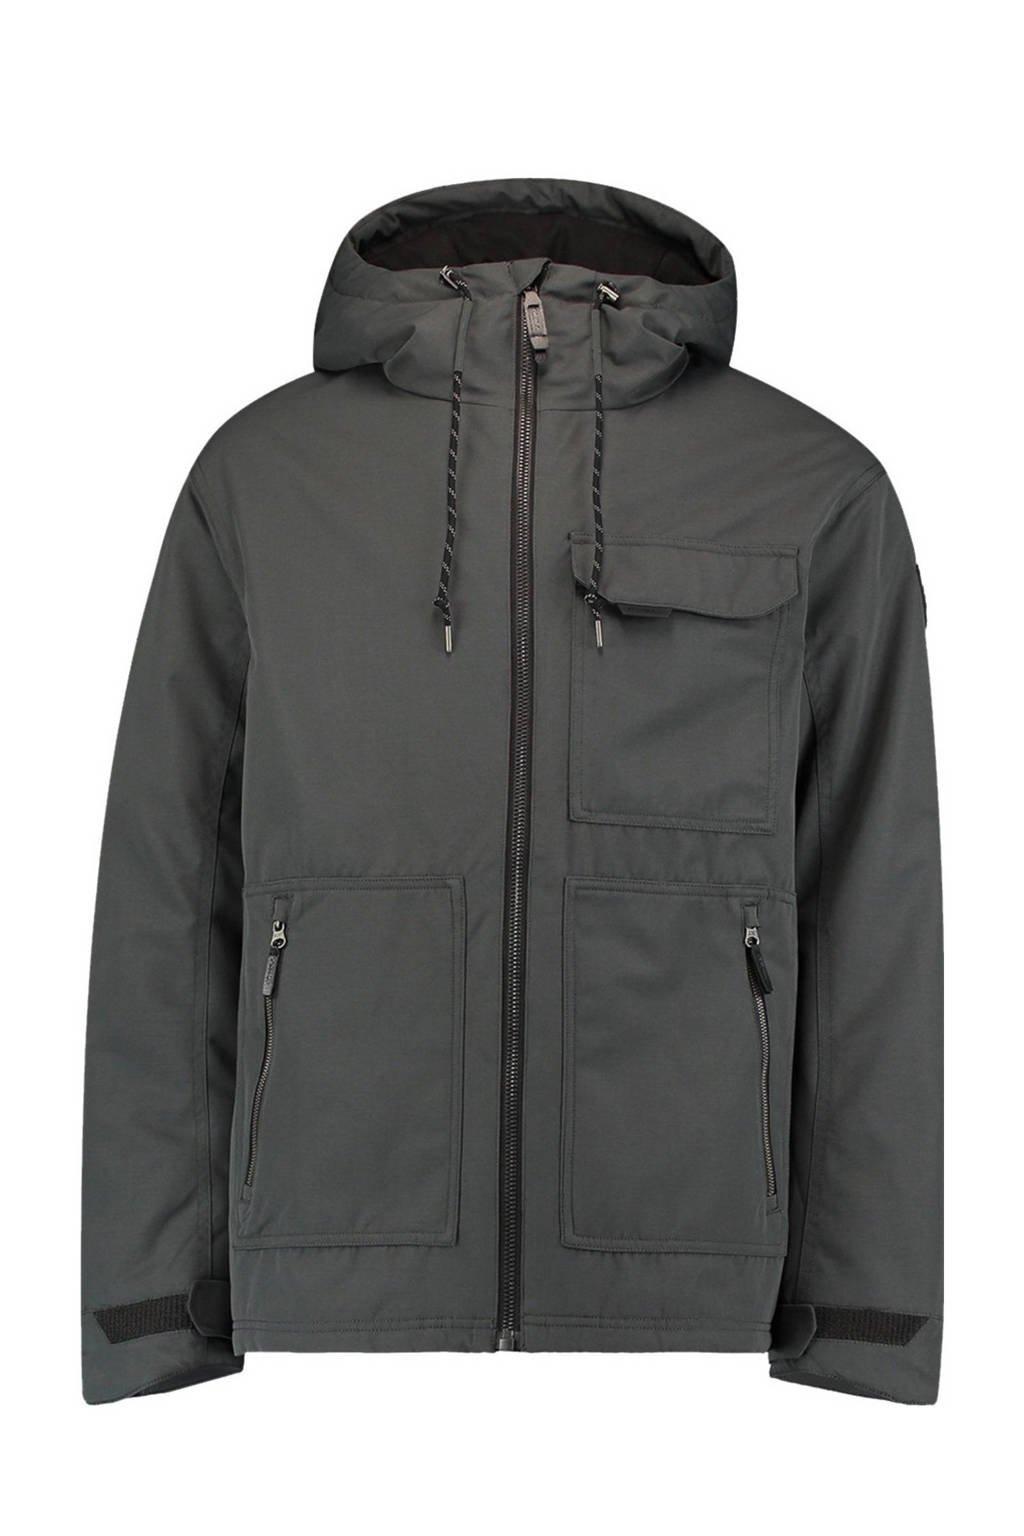 O'Neill outdoor jas Urban Utility grijs, Pirate Black